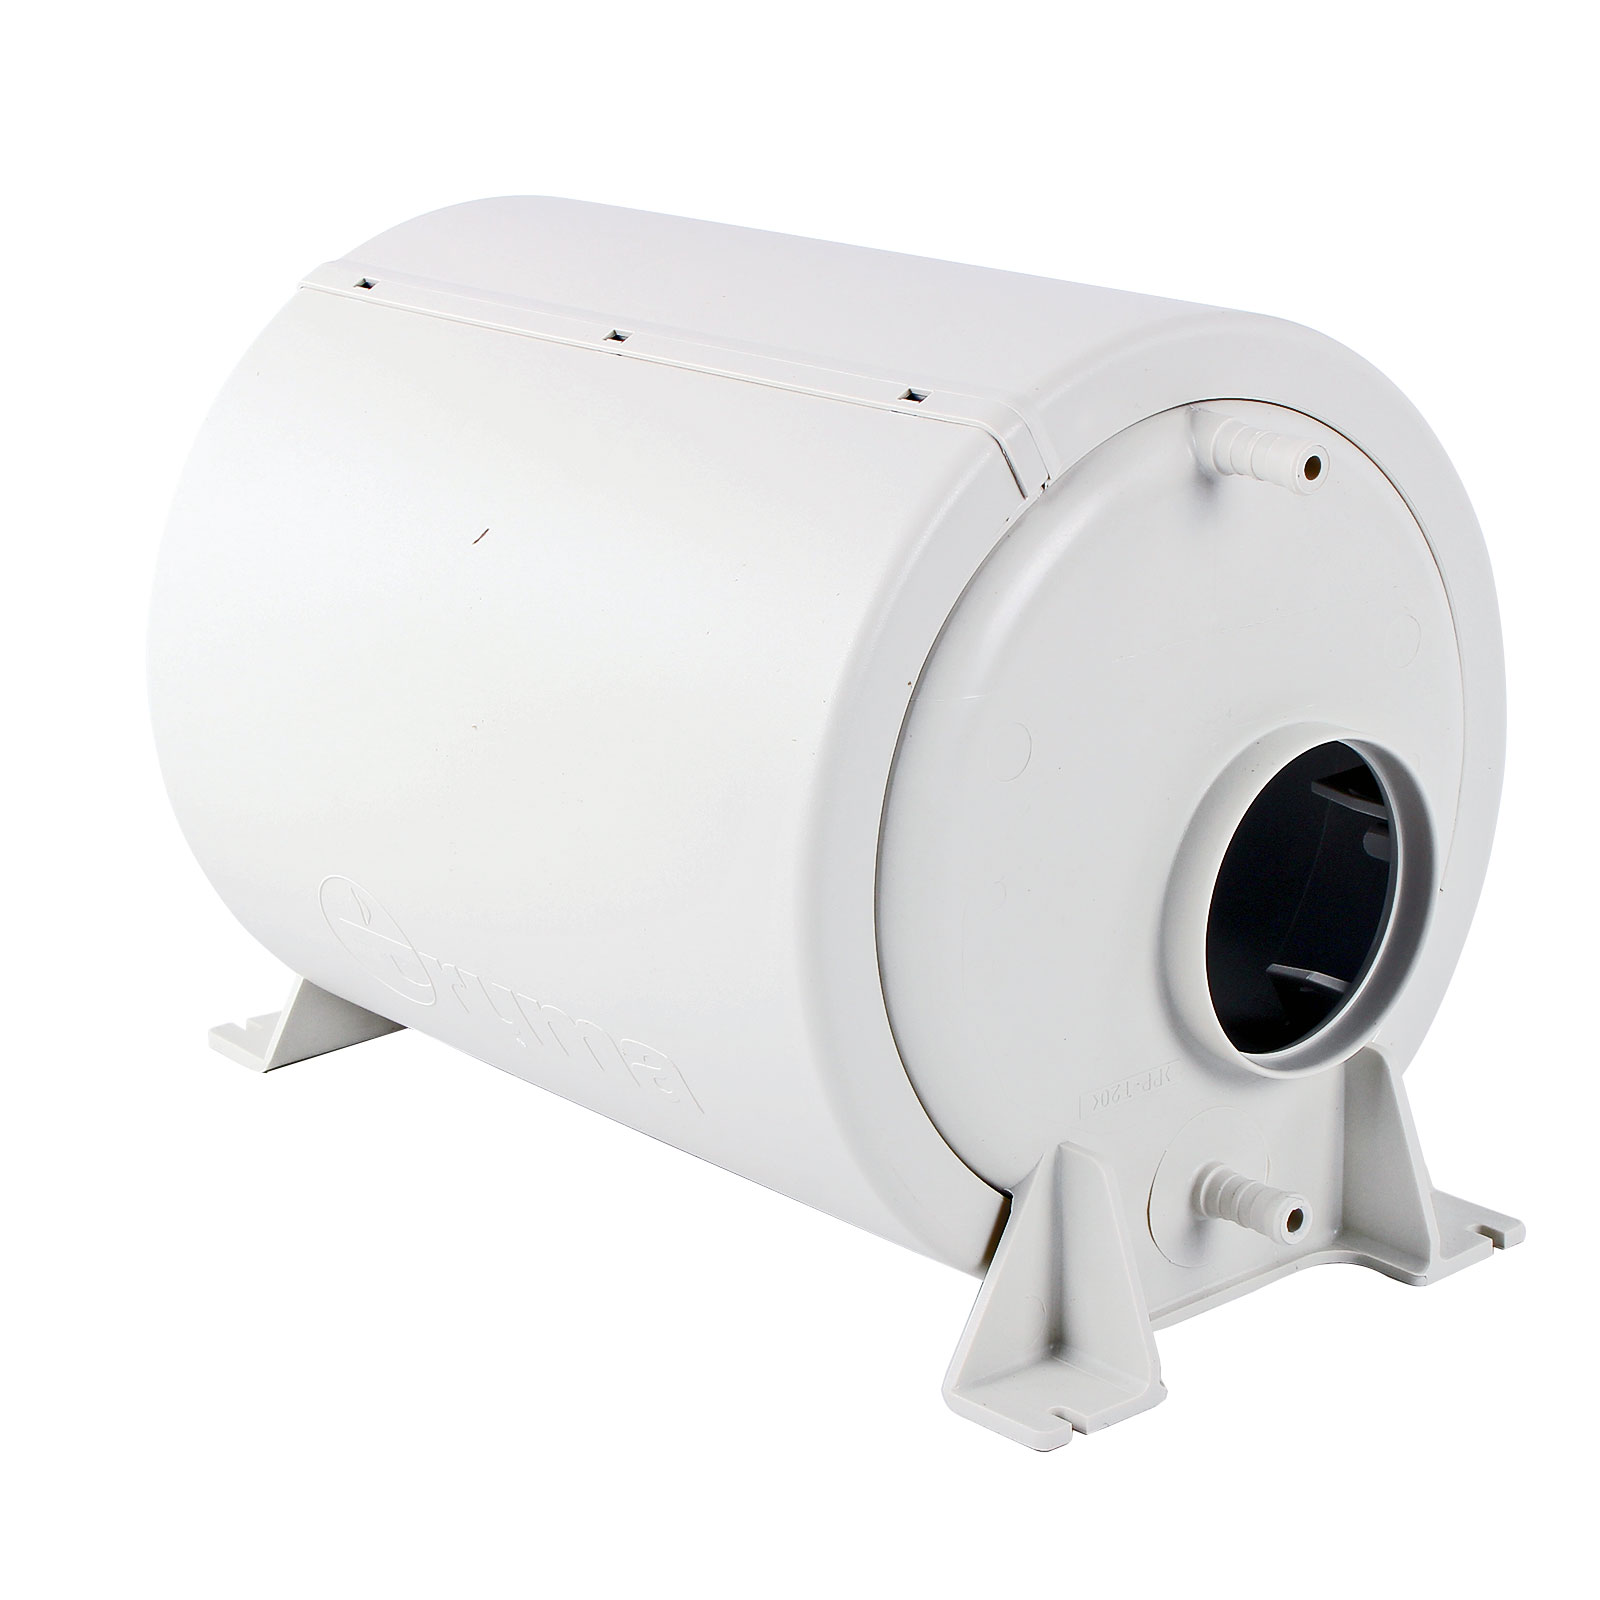 truma tt2 therme ersatzbeh lter 5 liter wei inkl 2x ventile 3x o ring. Black Bedroom Furniture Sets. Home Design Ideas